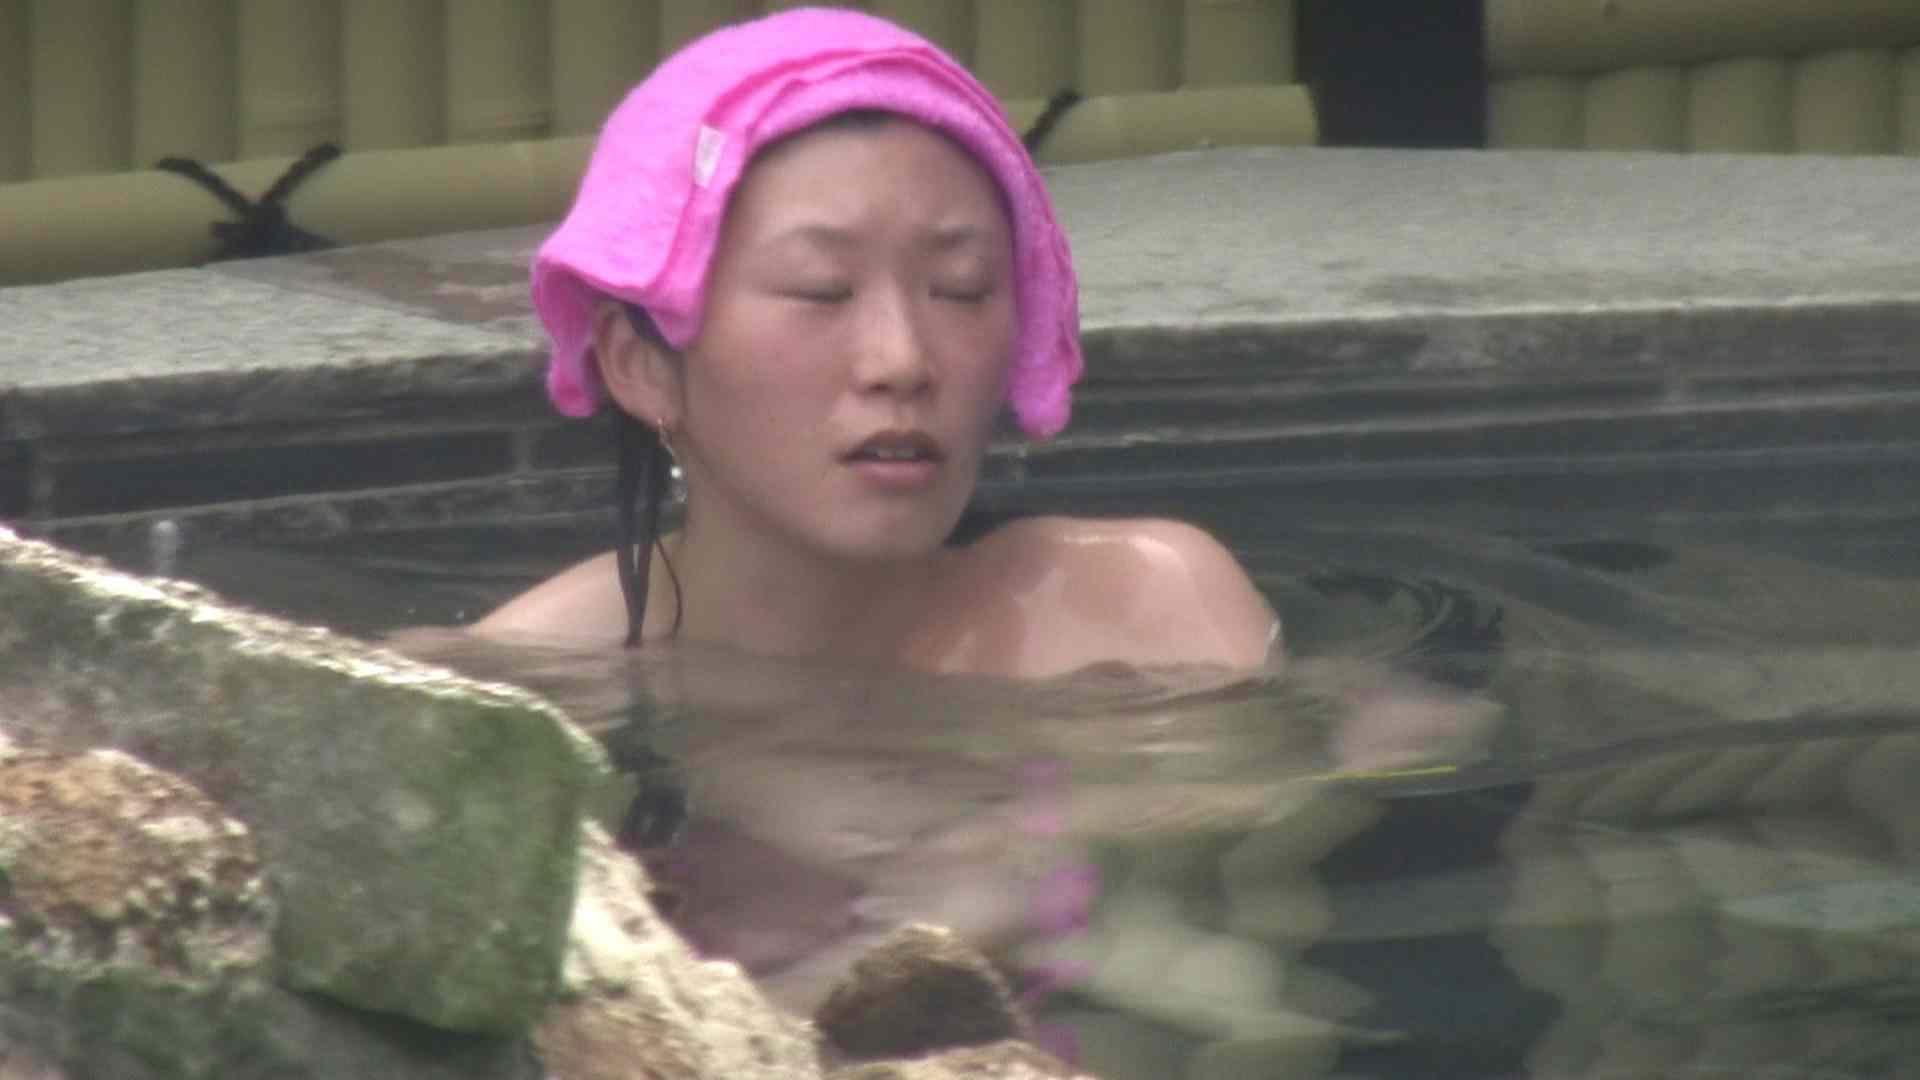 Aquaな露天風呂Vol.127 盗撮師作品 | 露天風呂突入  77pic 76